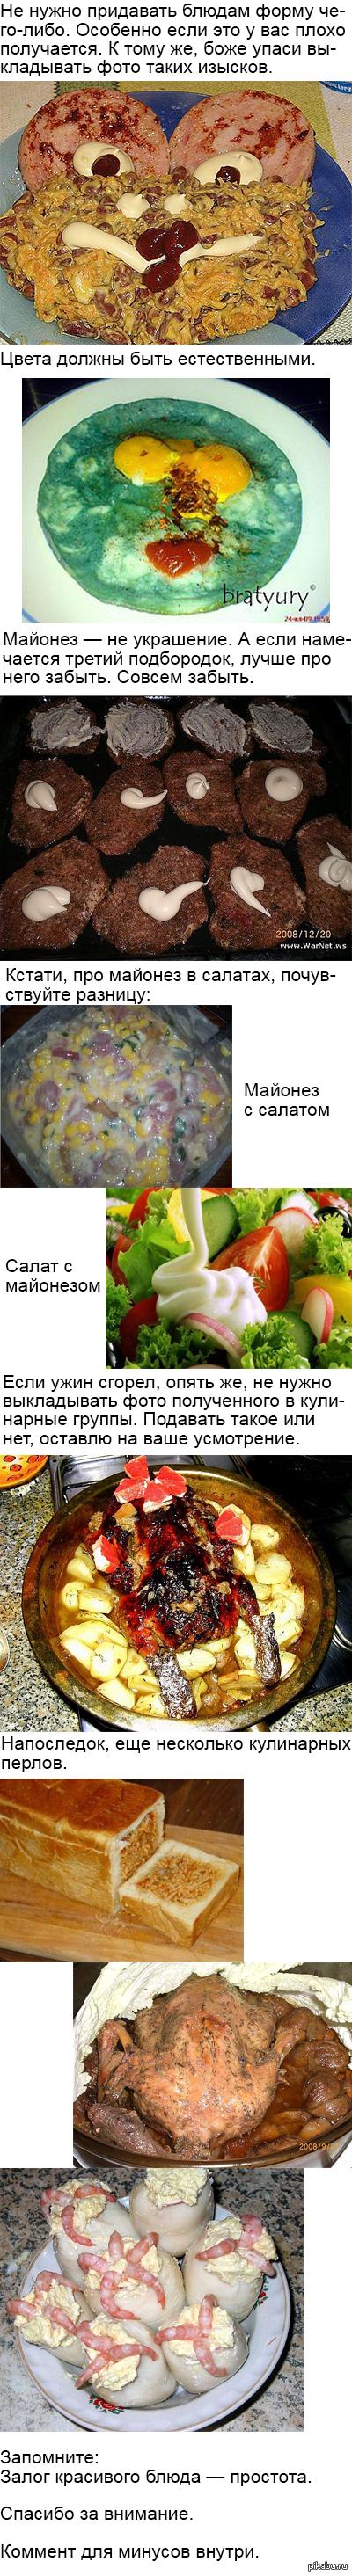 кулинария готовить